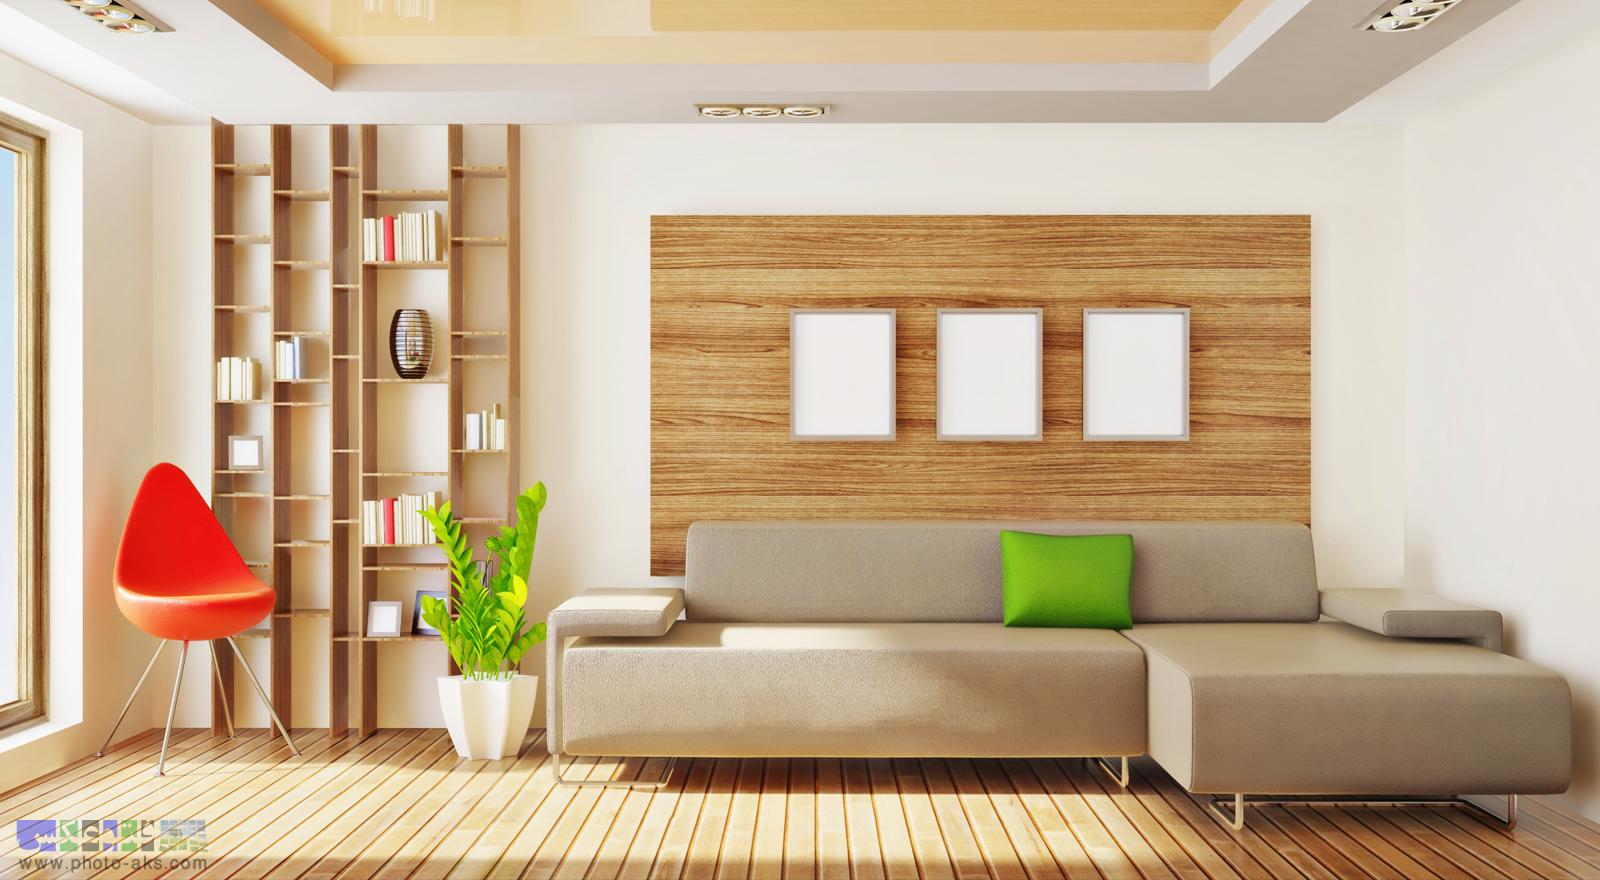 دوکراسیون چوبی حال کوچک. wooden decoration